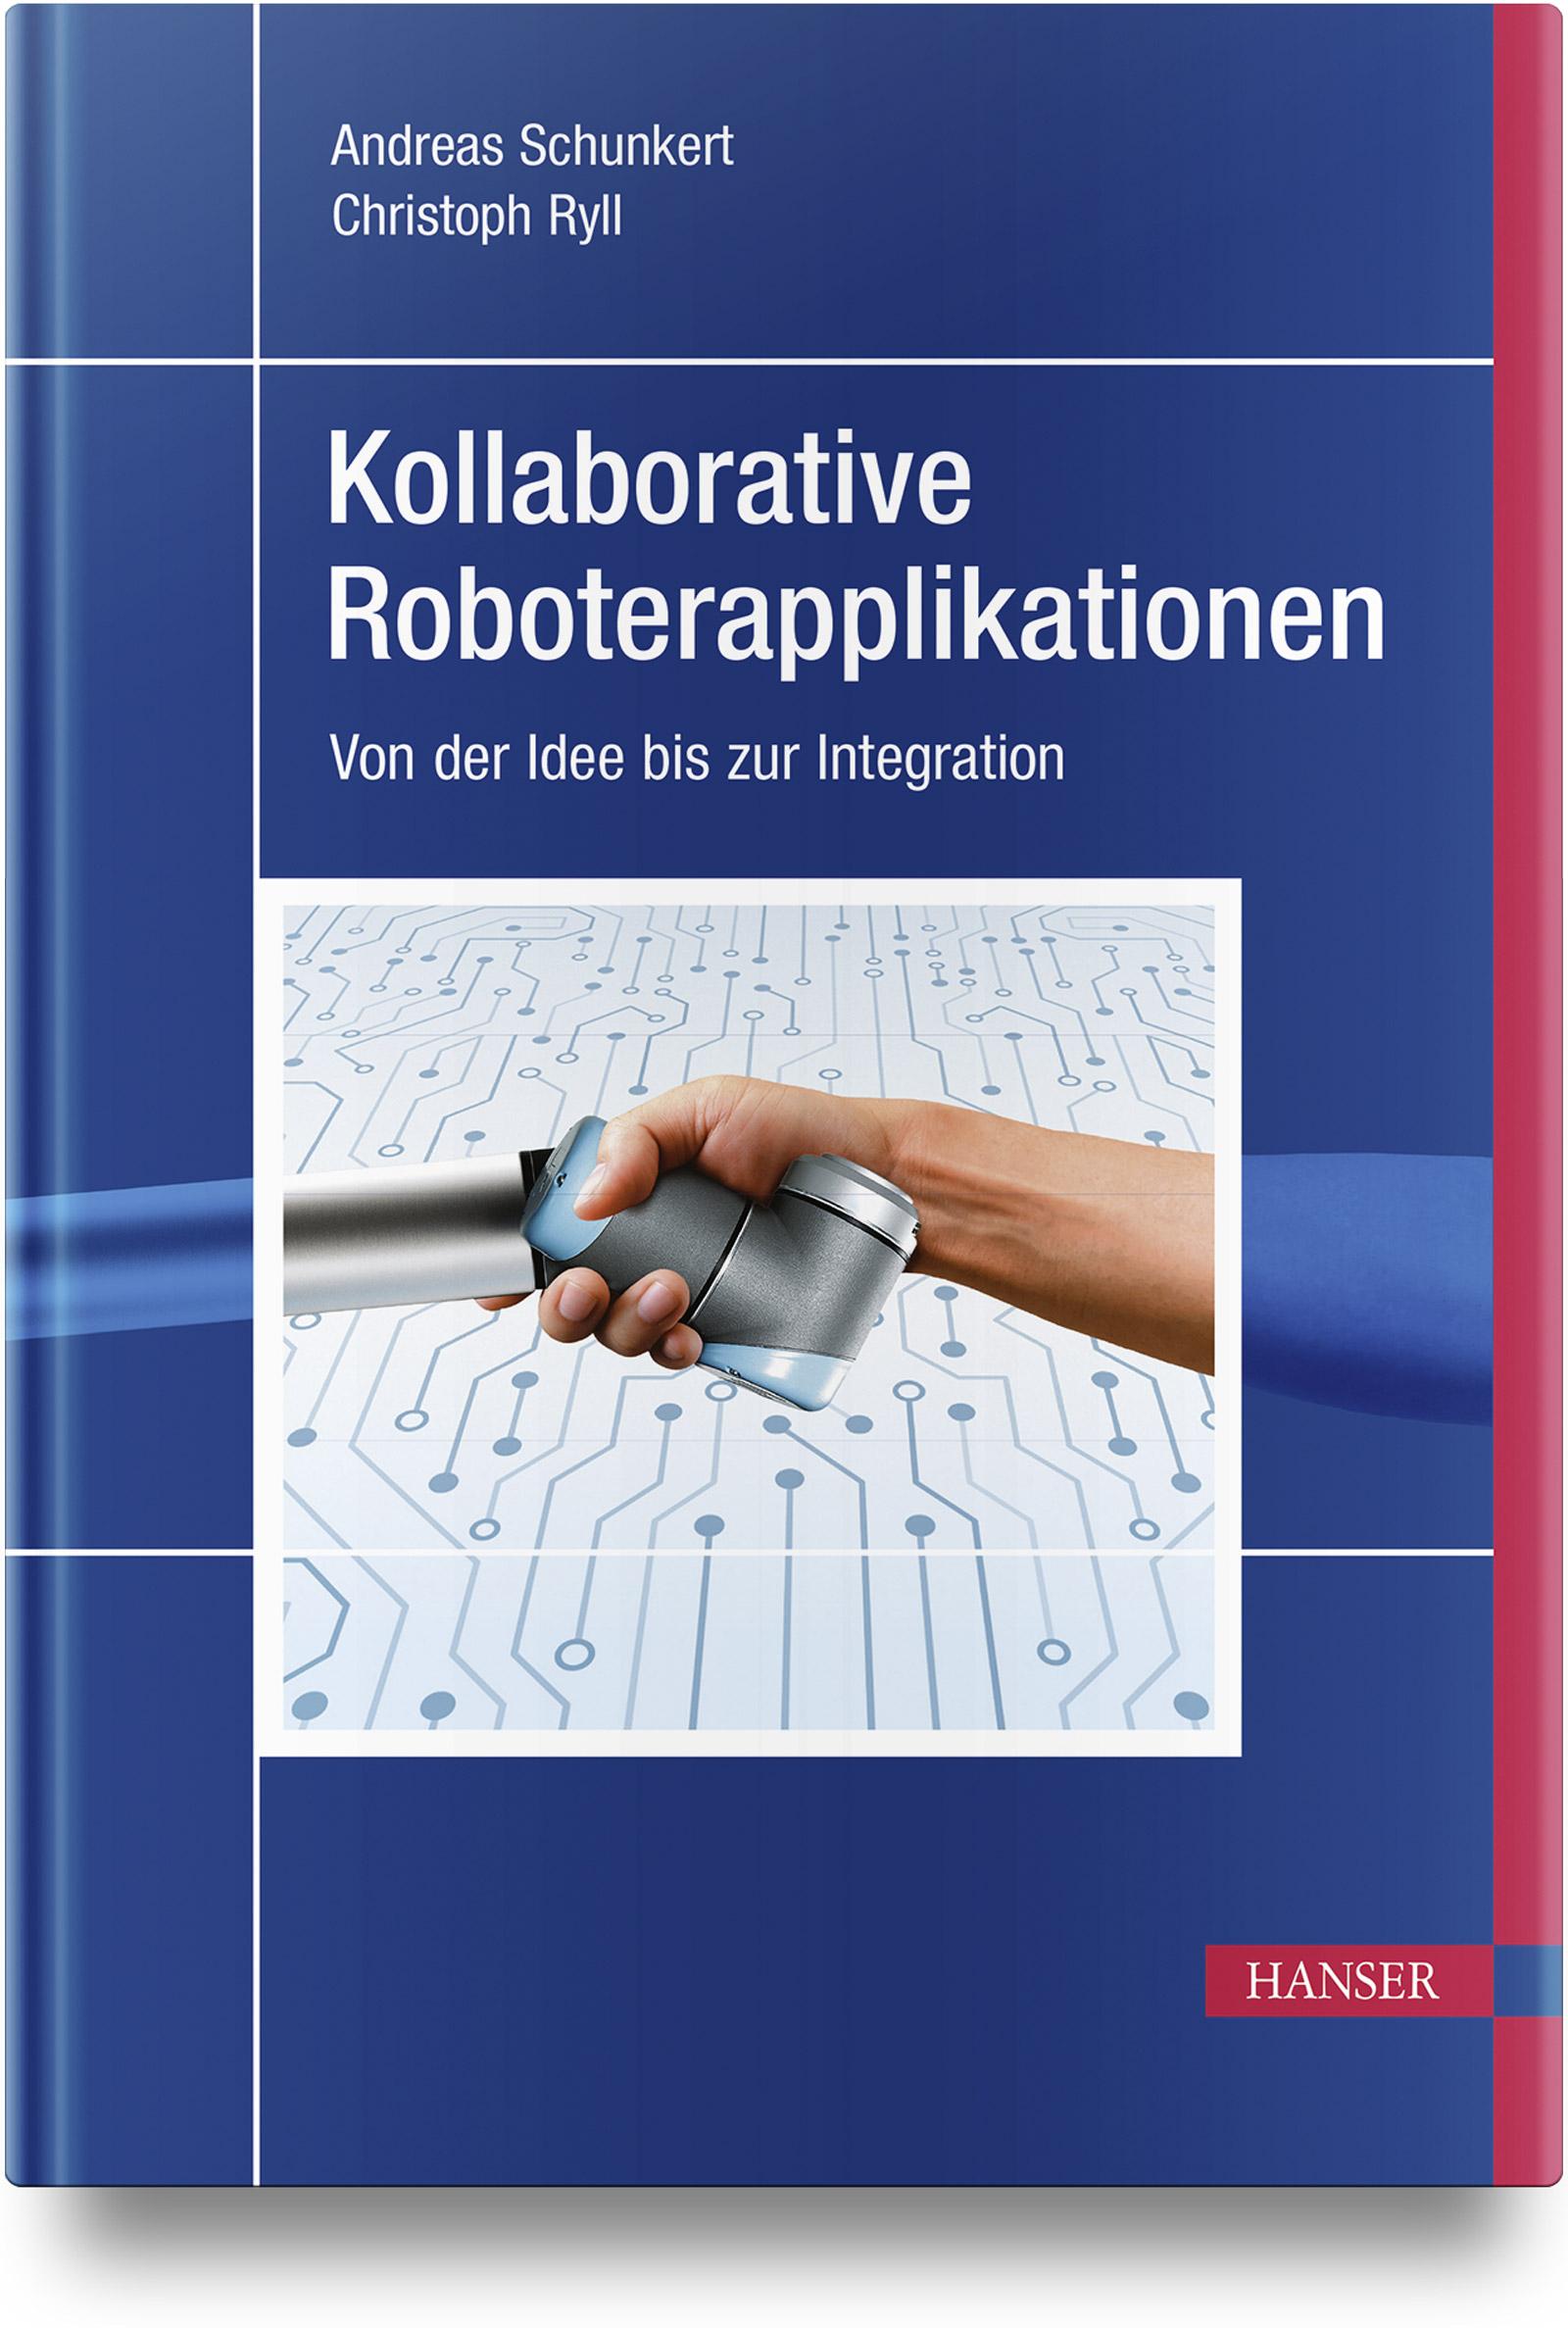 Schunkert, Kollaborative Roboterapplikationen, 978-3-446-46273-1